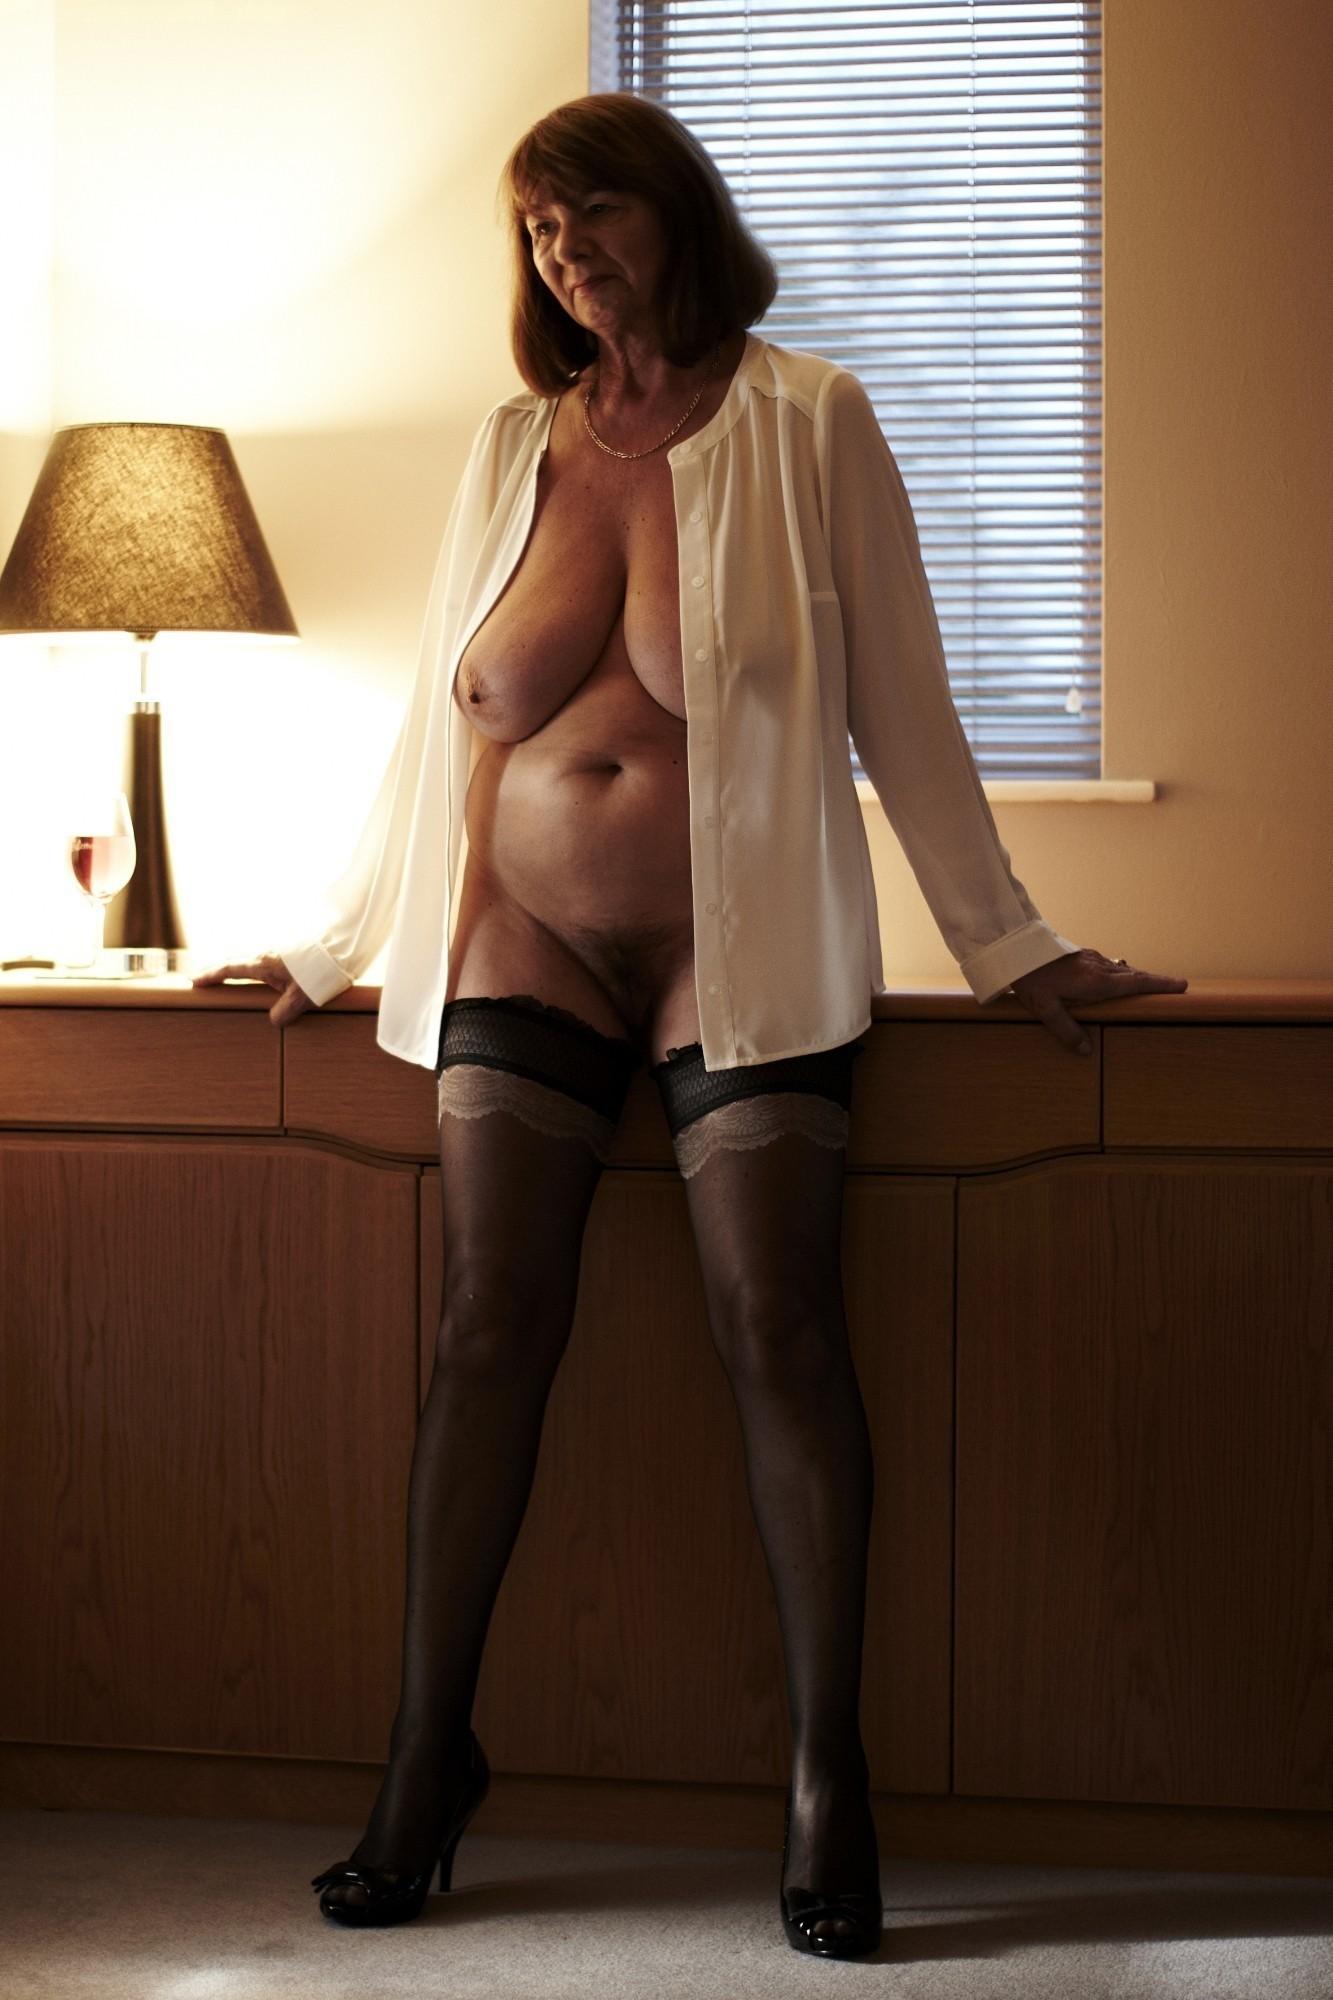 Mature woman hot